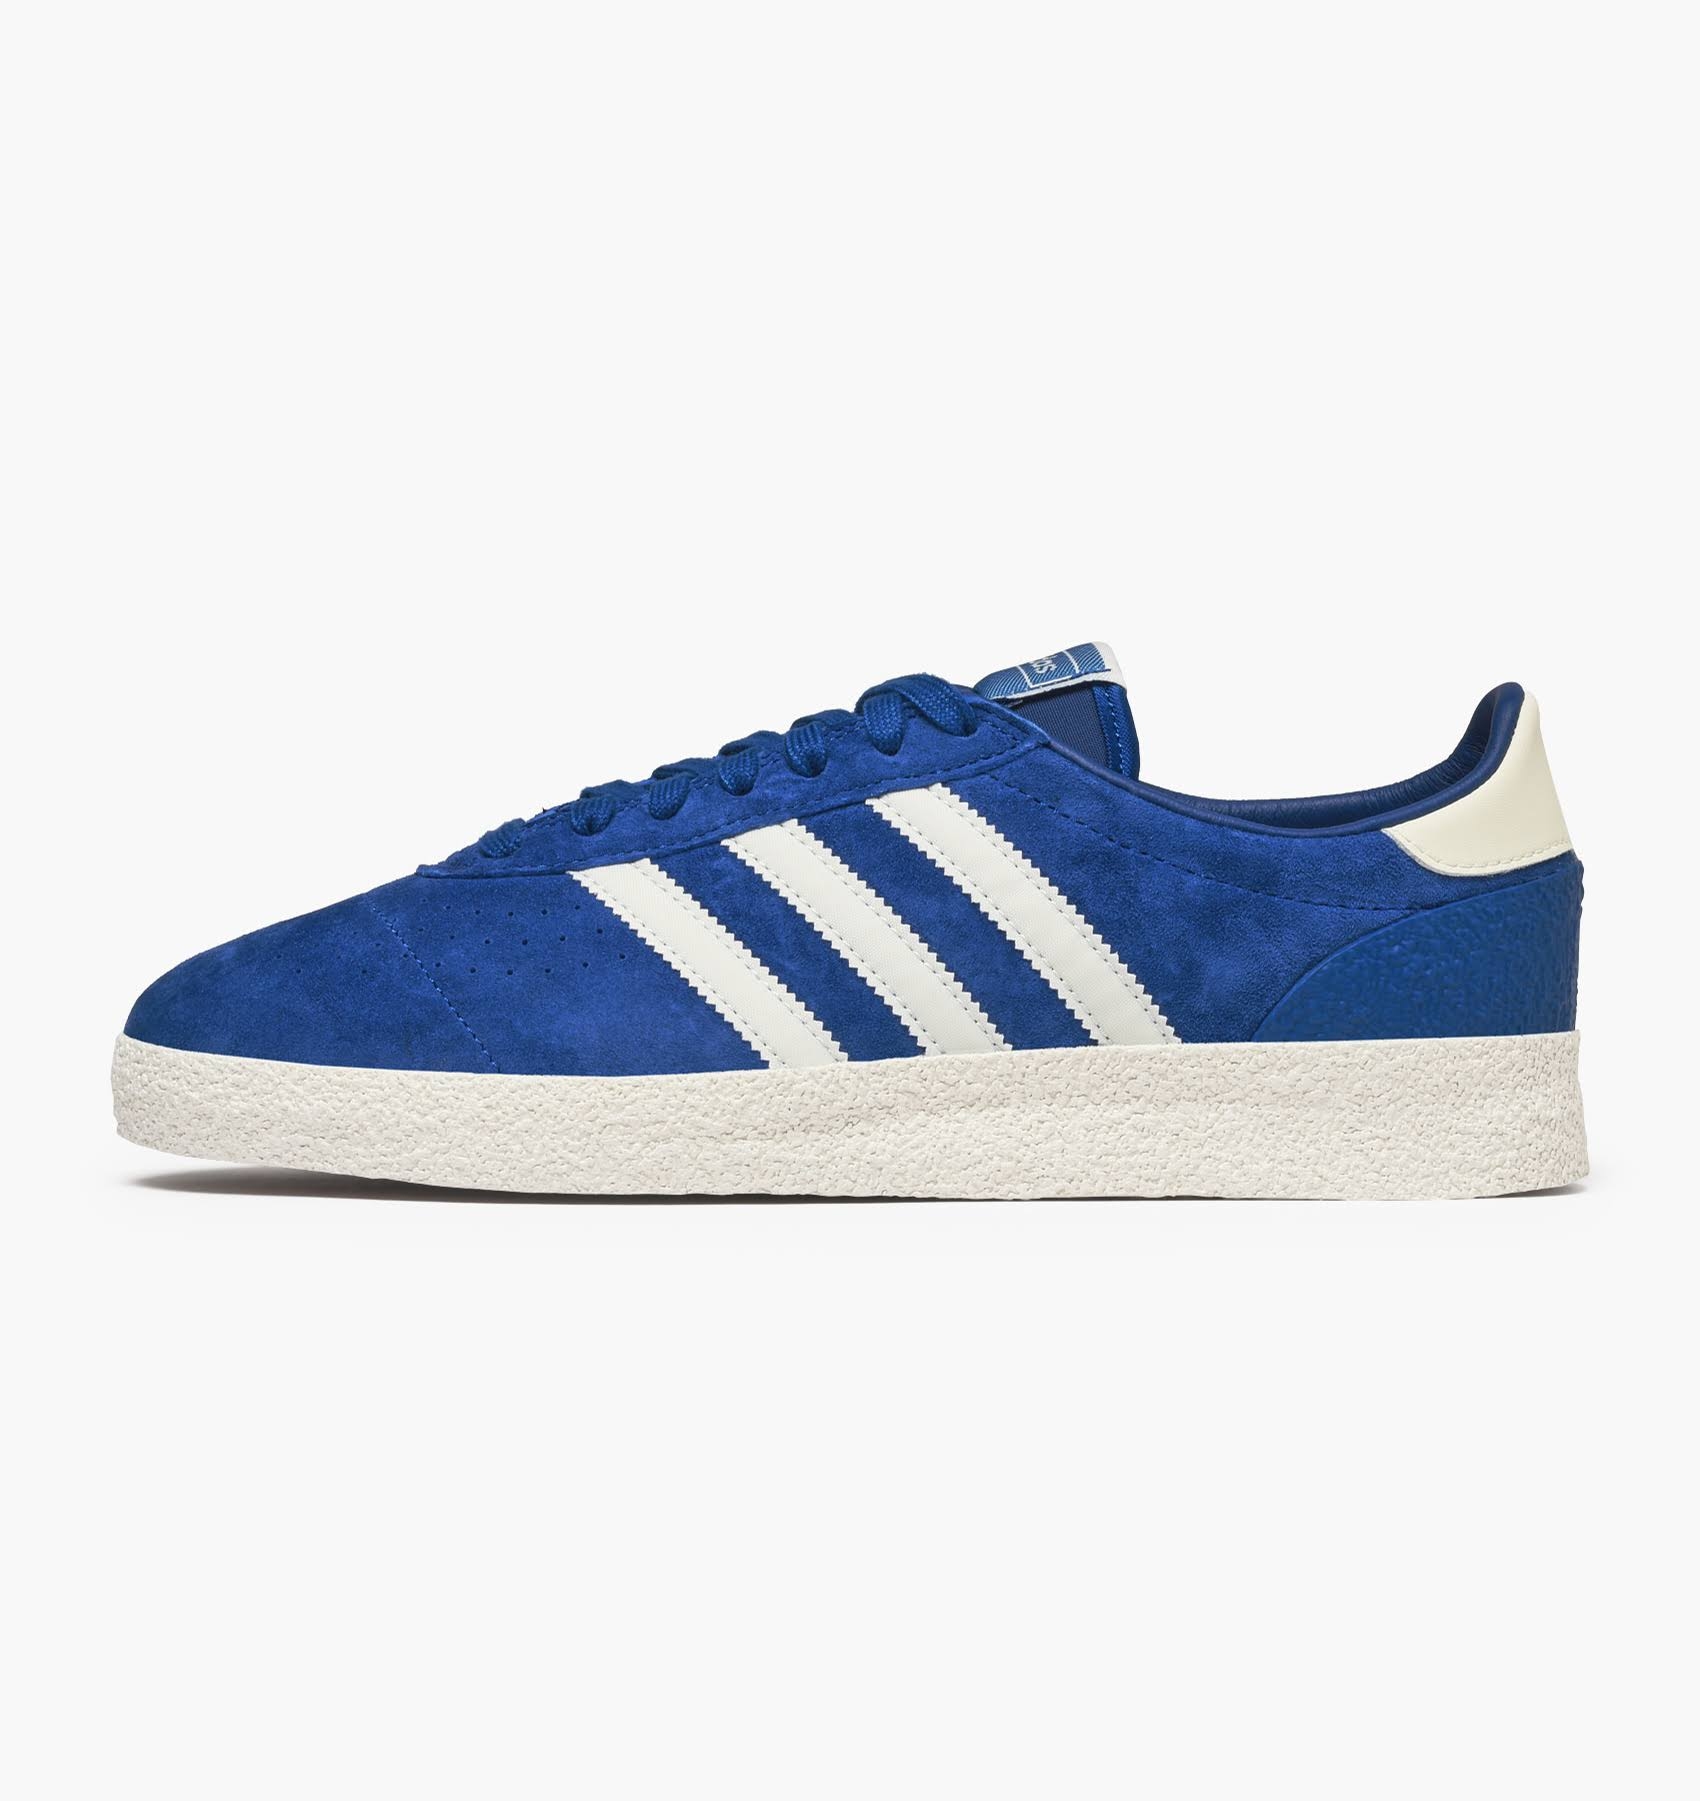 Us SpezialMunich 5 Blue Super Adidas 4 Unisex Spzl Sneakers rBdxeQECoW